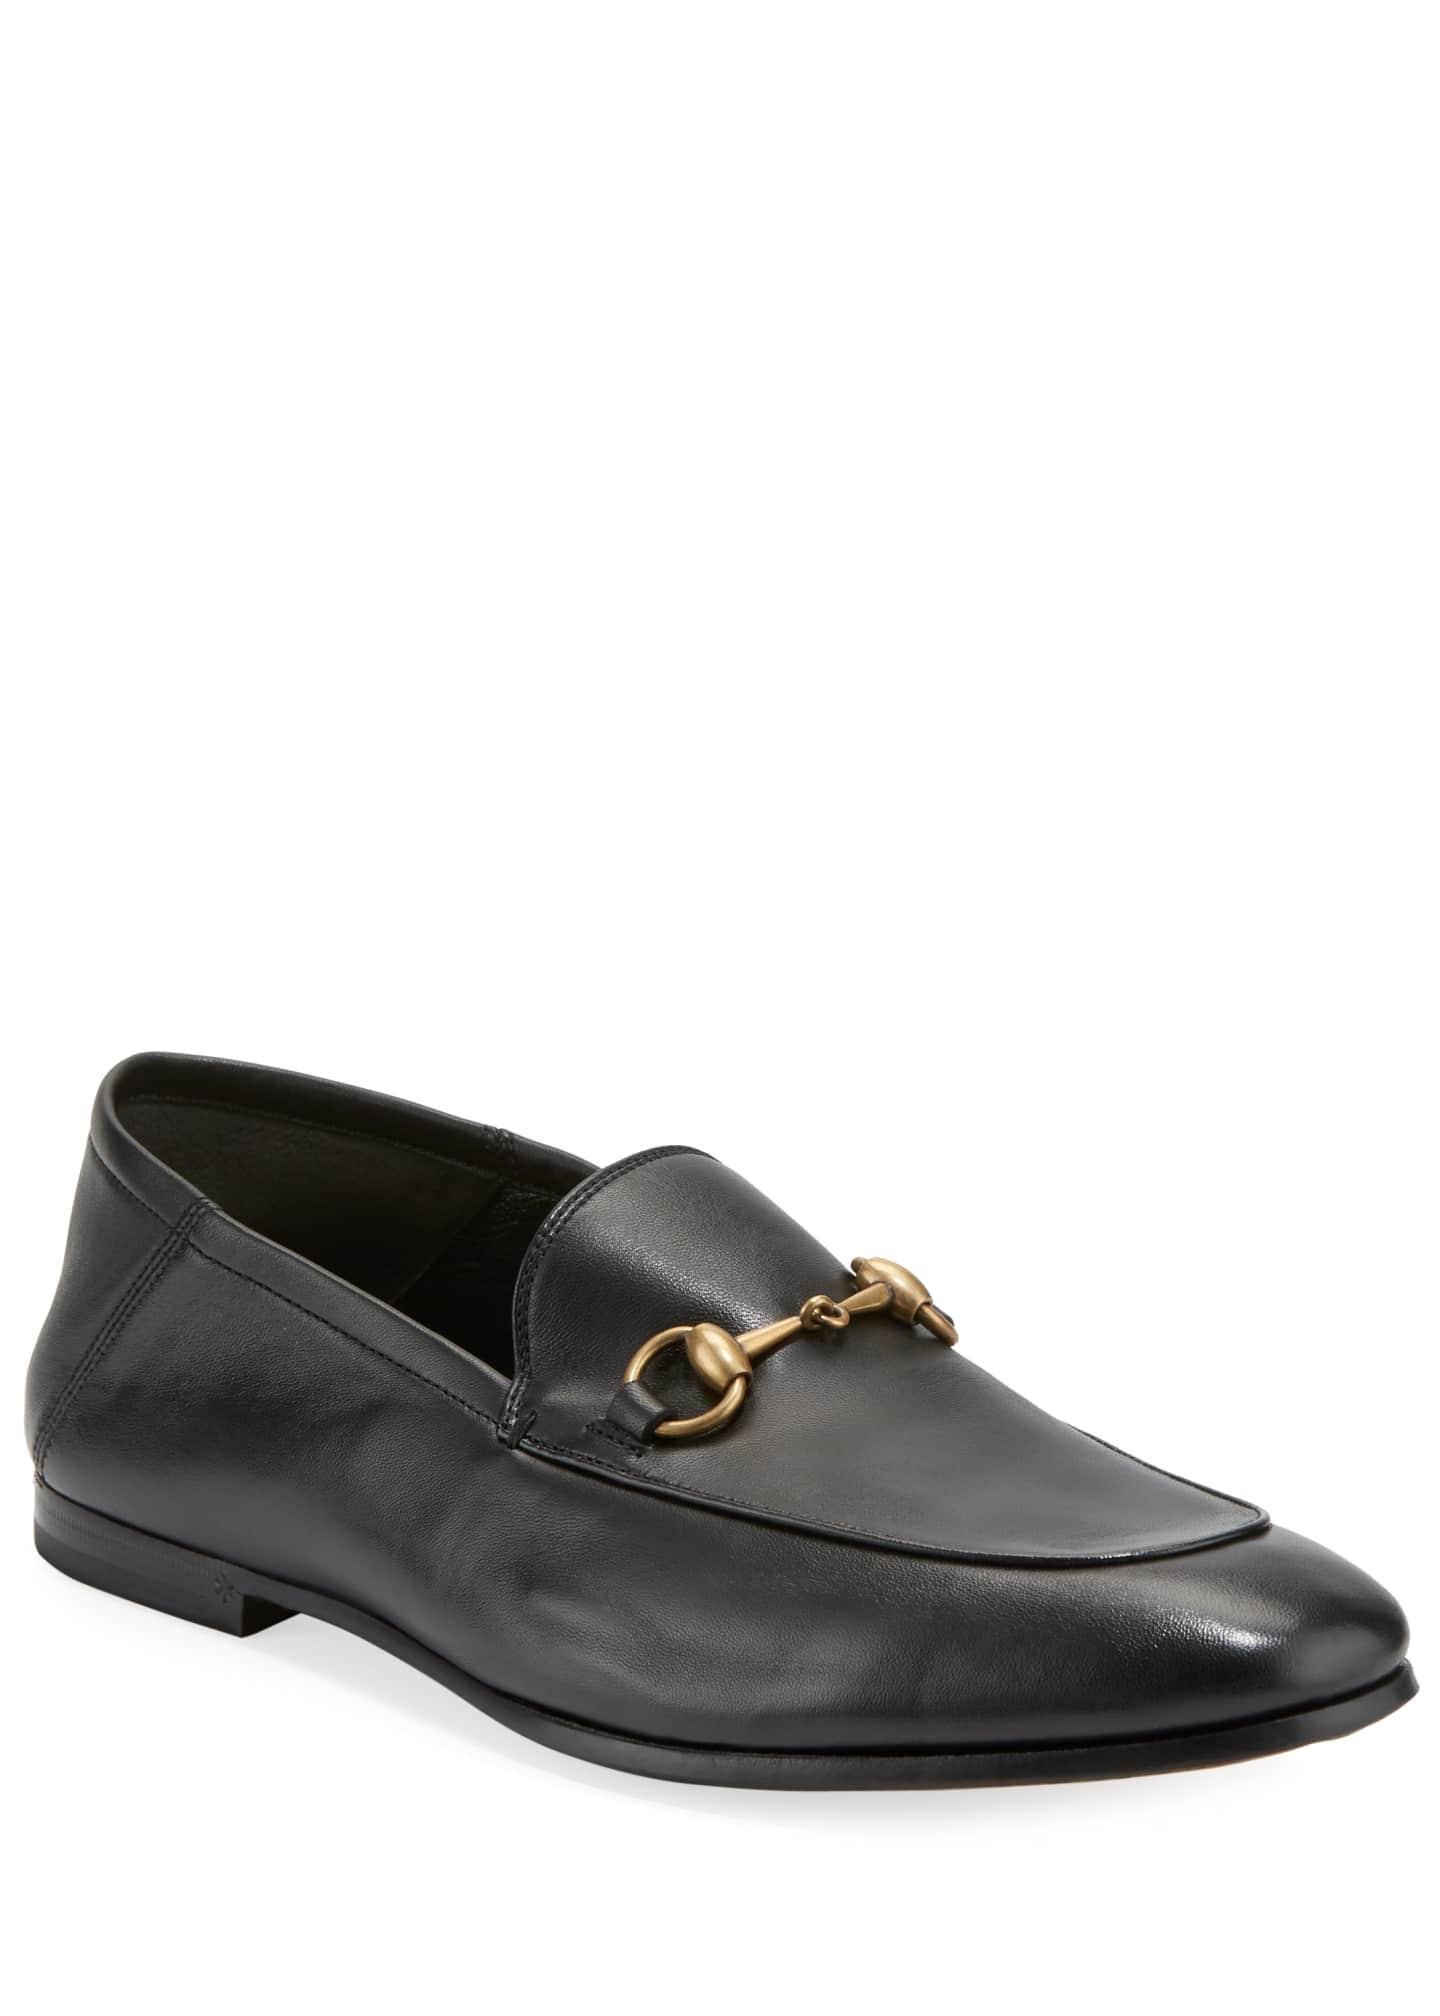 Gucci Brixton Soft Leather Bit-Strap Loafer